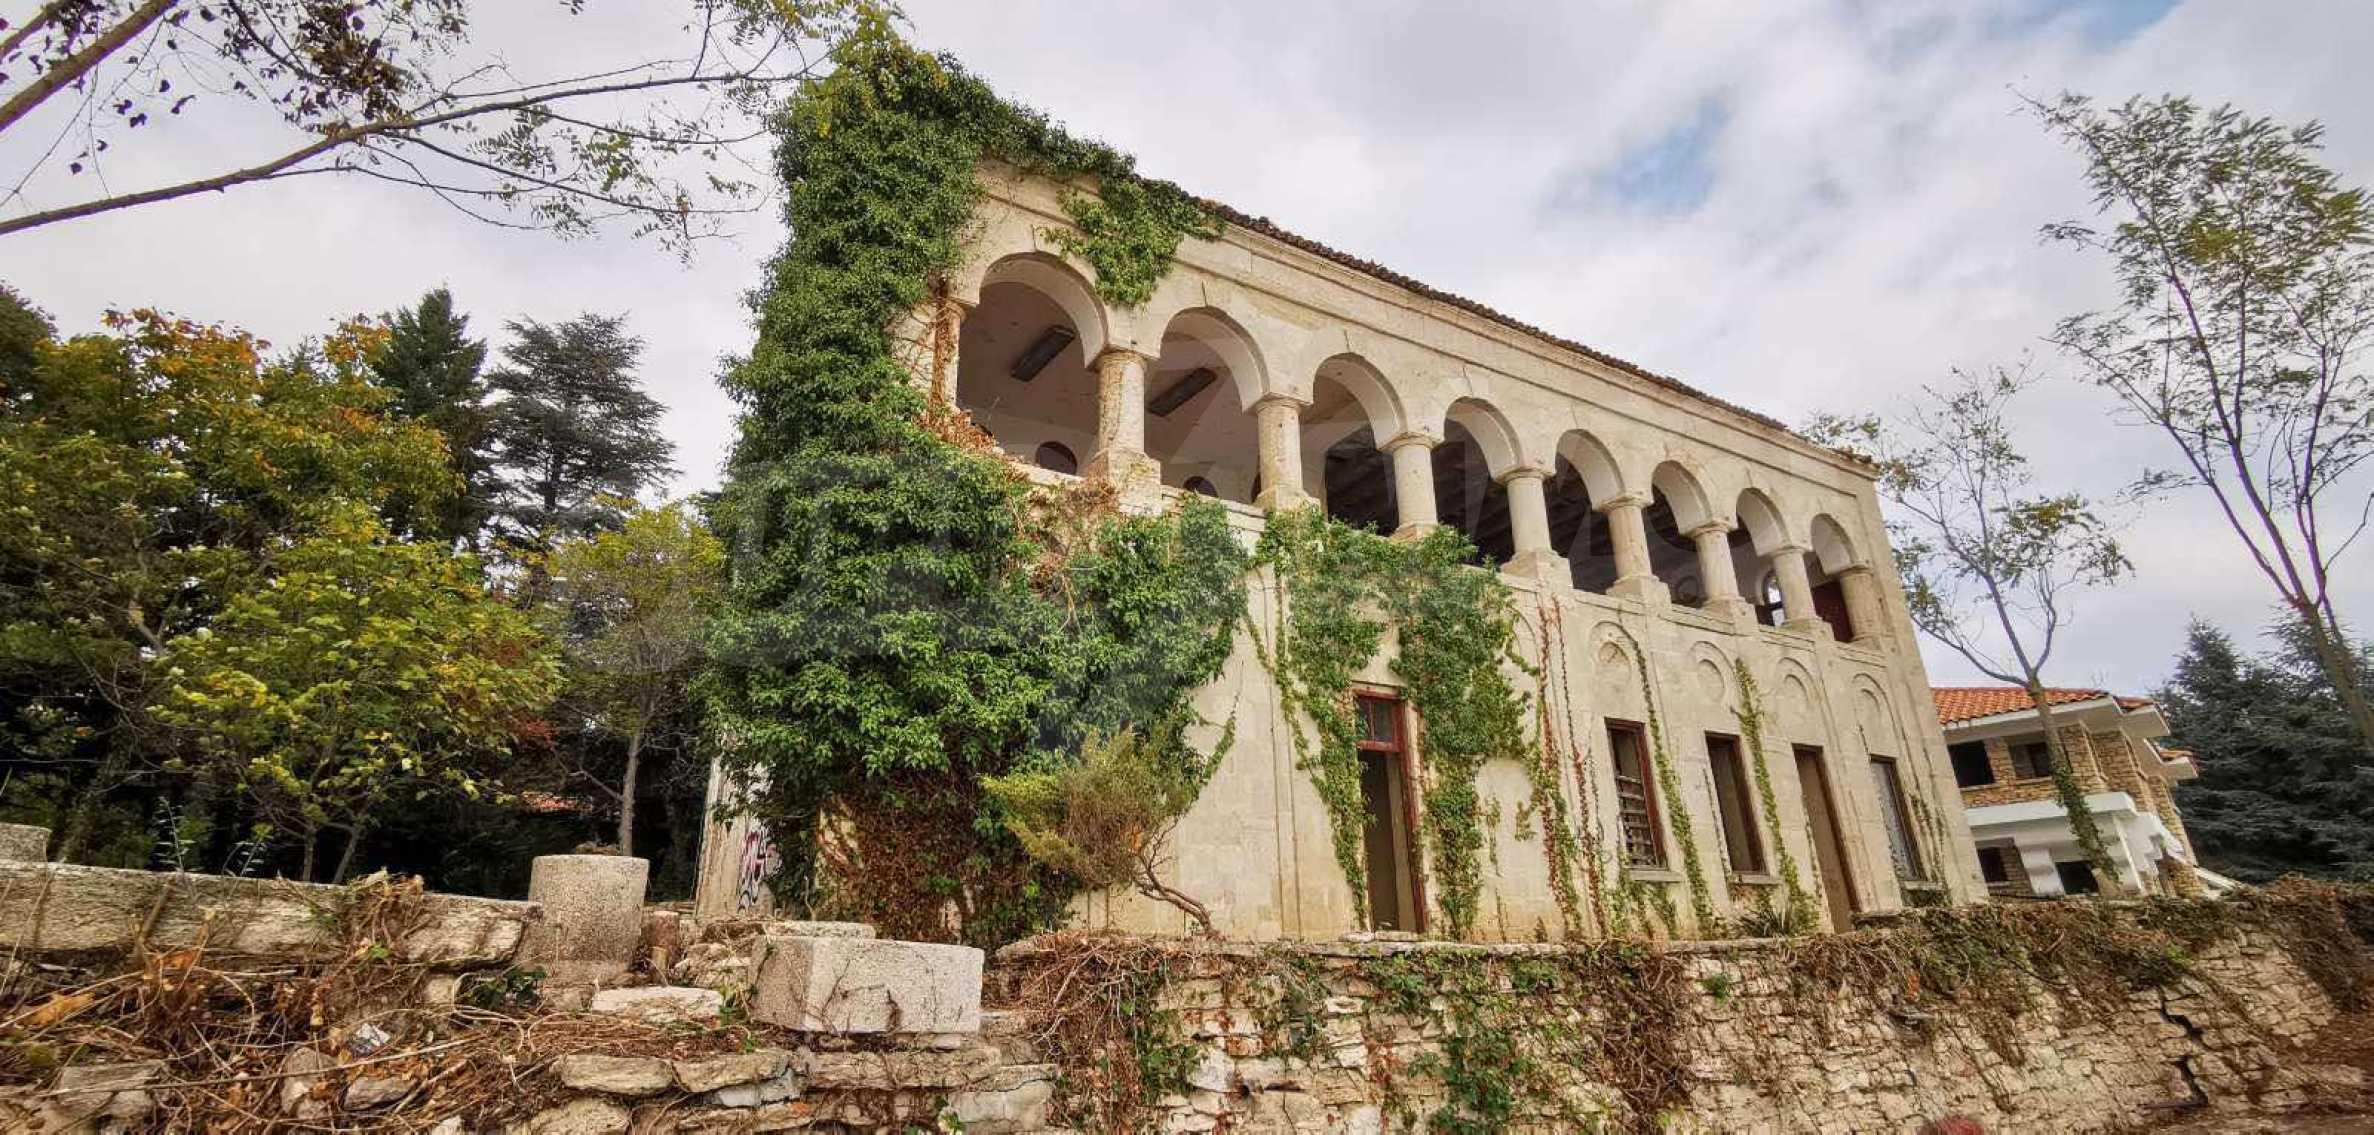 Villa Storck - an aristocratic mansion on the beach